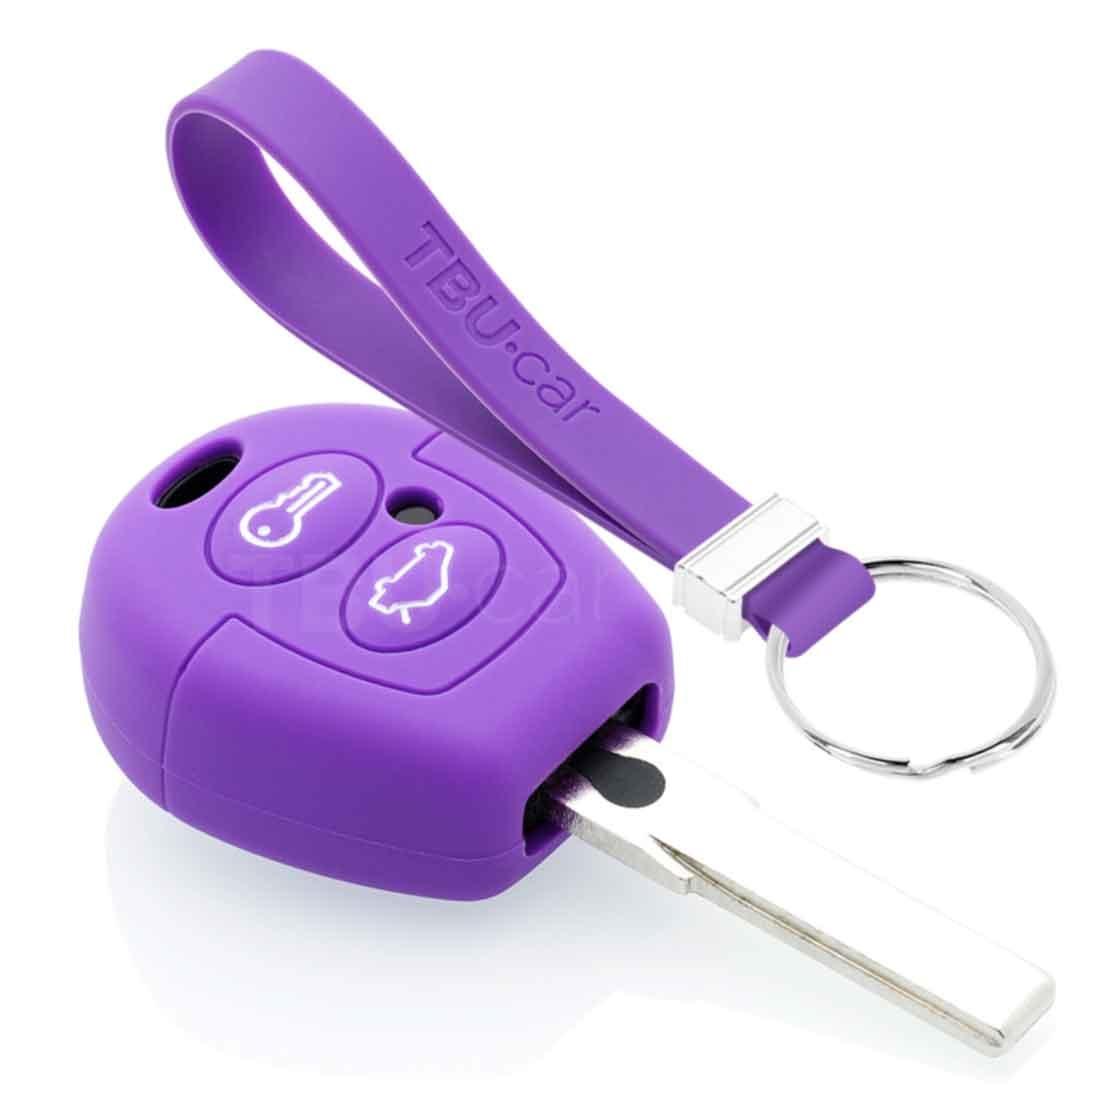 TBU car TBU car Autoschlüssel Hülle kompatibel mit Ford 2 Tasten - Schutzhülle aus Silikon - Auto Schlüsselhülle Cover in Violett